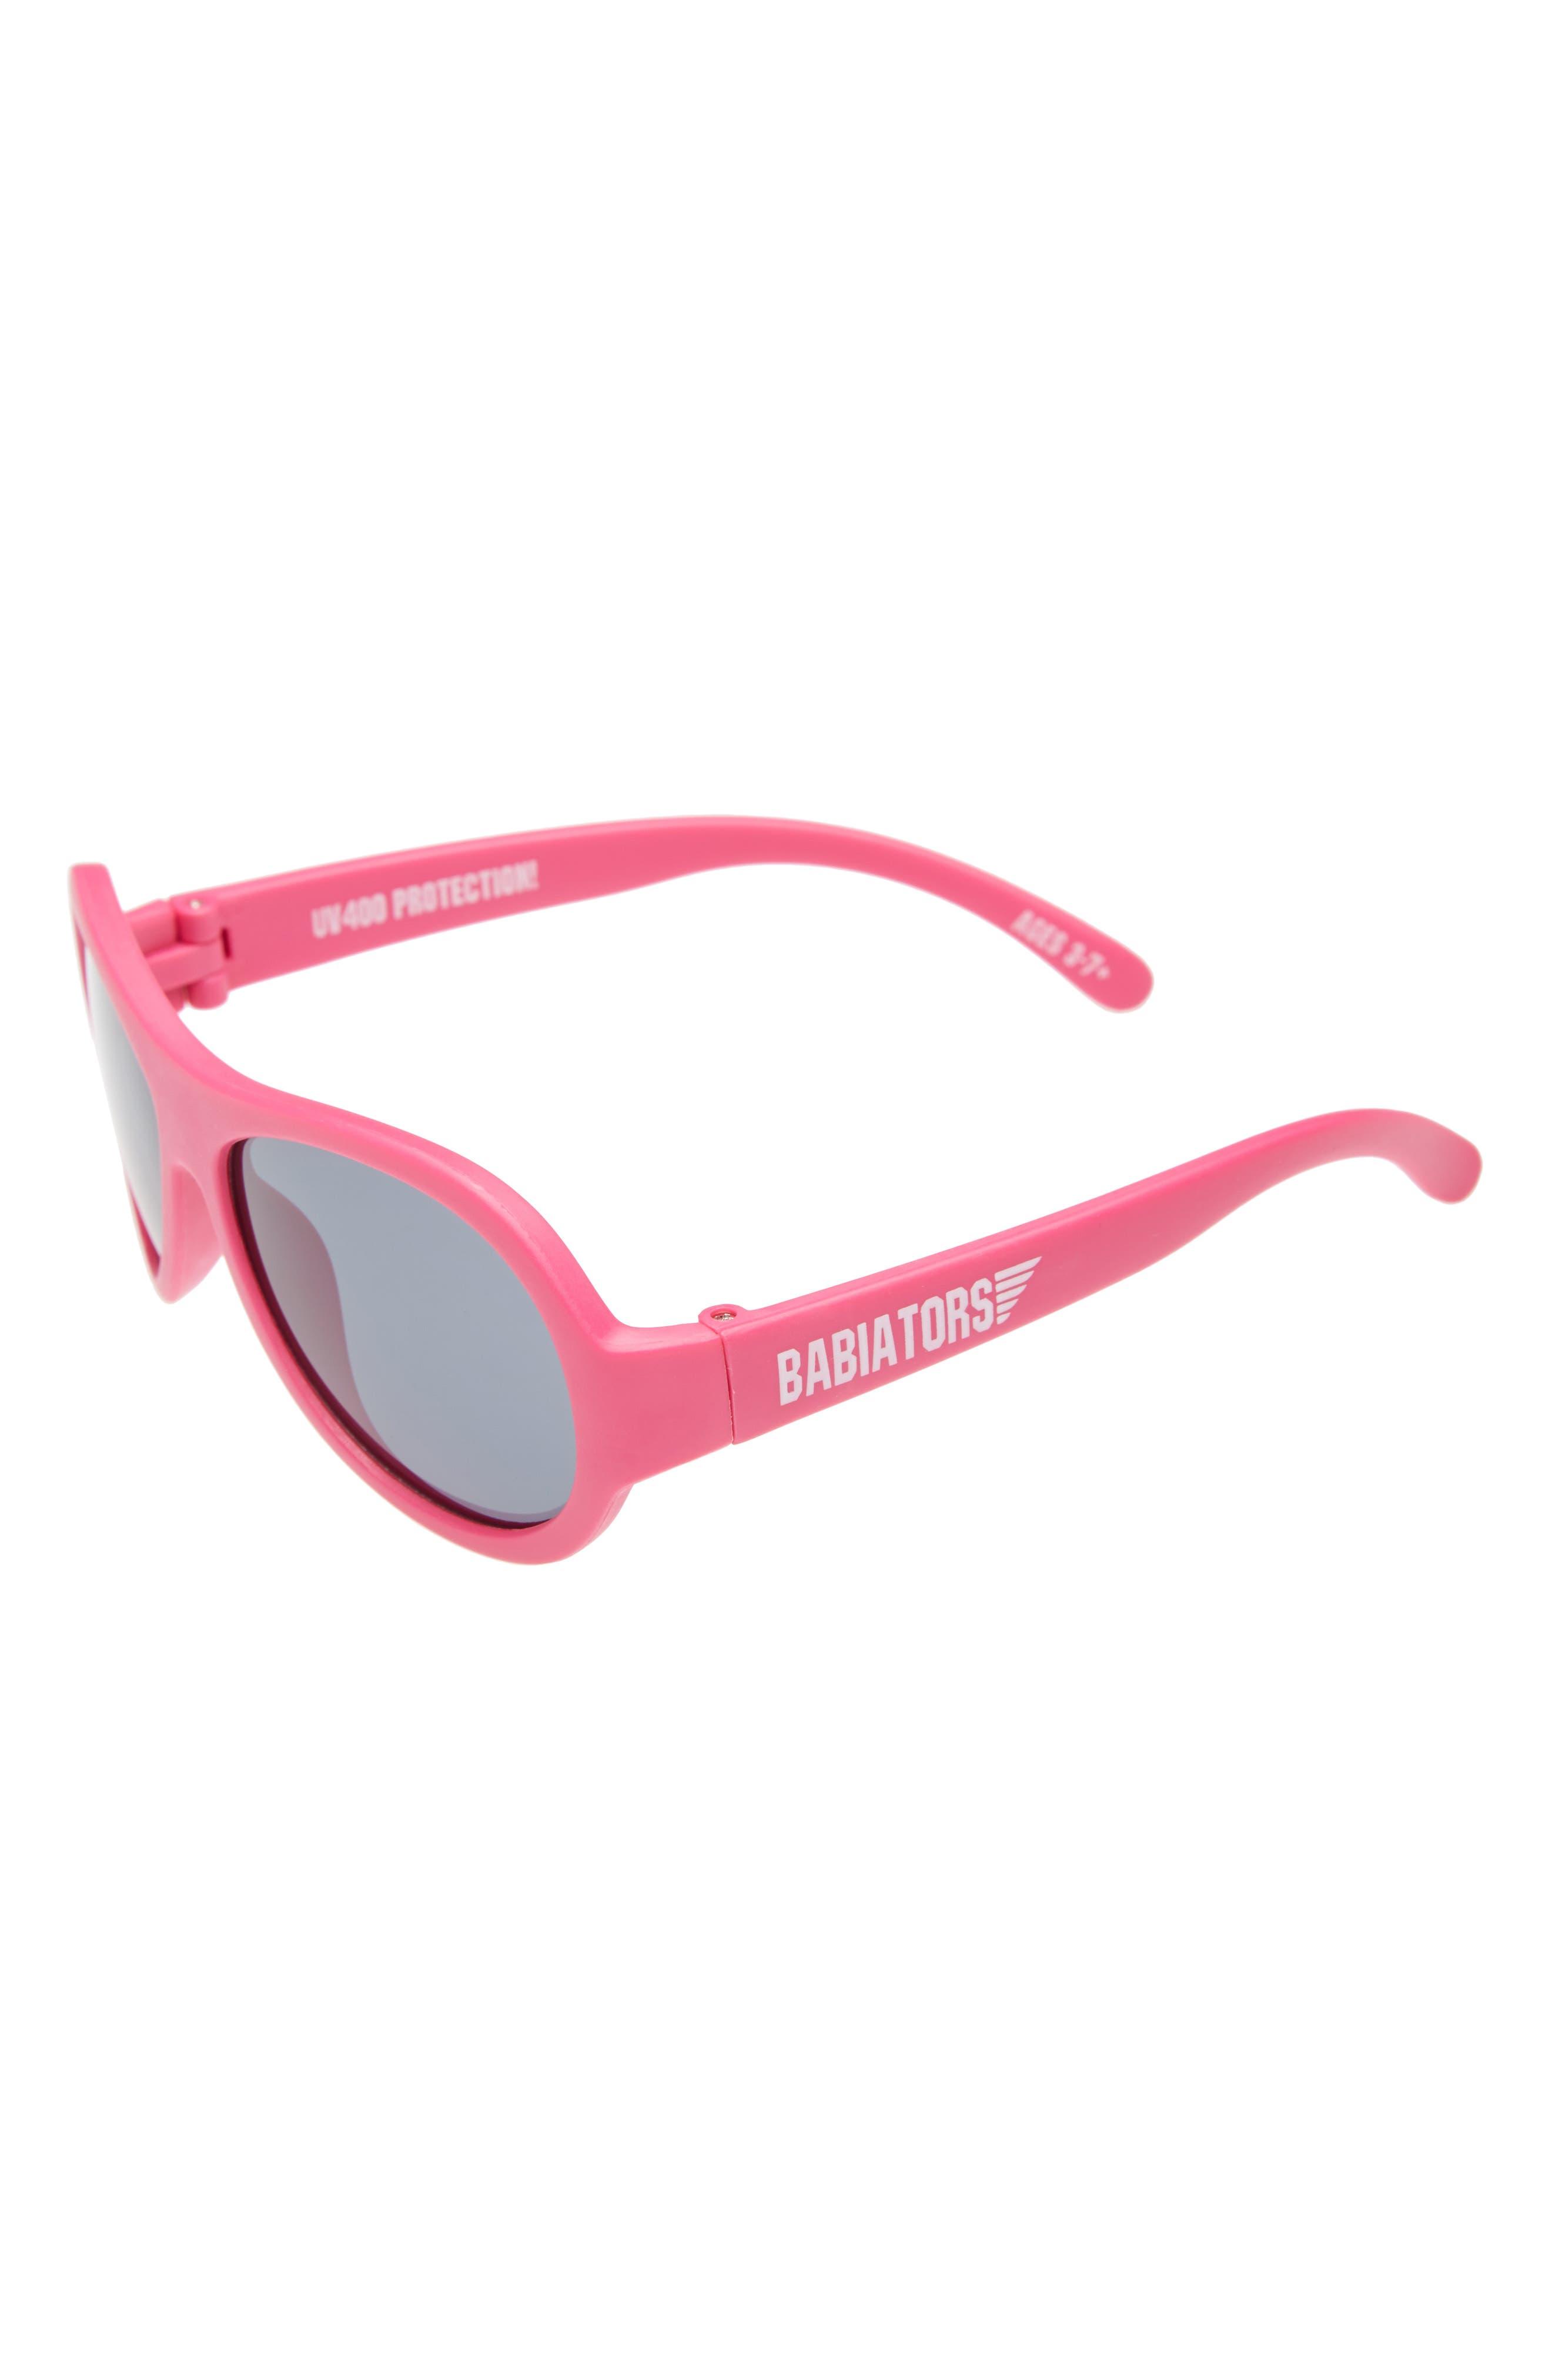 BABIATORS, Original Aviator Sunglasses, Main thumbnail 1, color, POPSTAR PINK